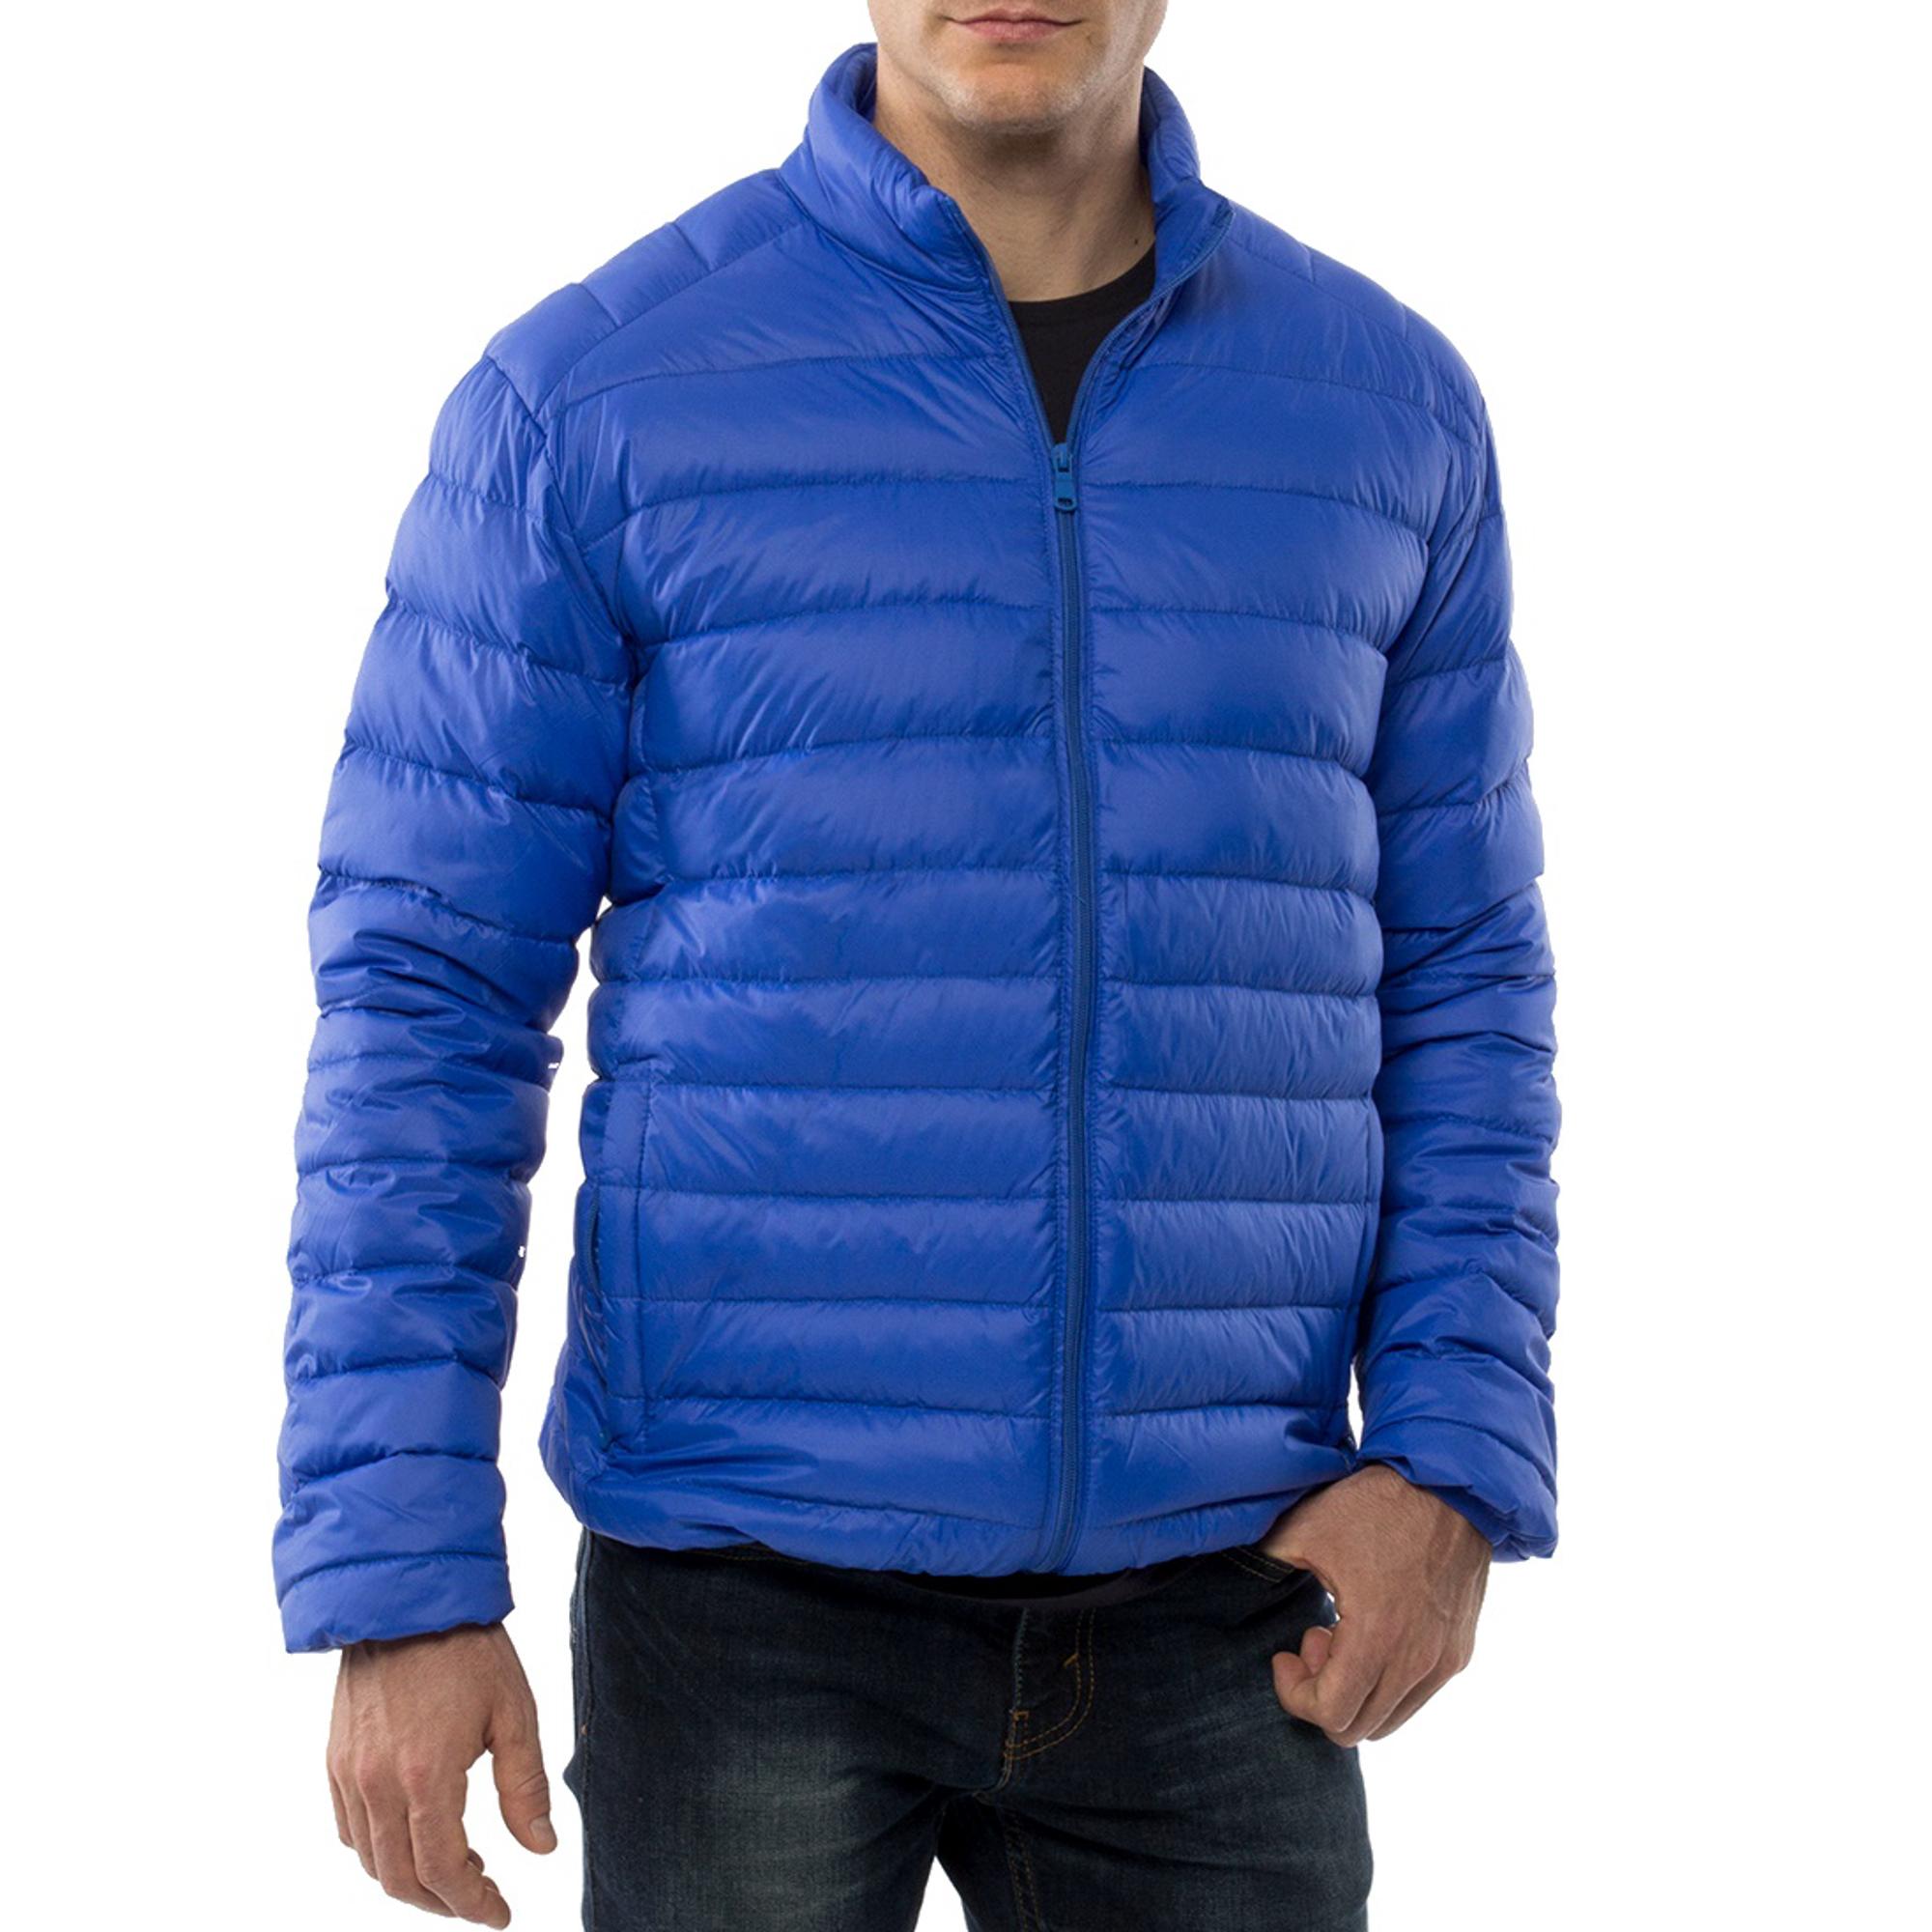 Alpine-Swiss-Niko-Packable-Light-Men-s-Down-Jacket-Puffer-Bubble-Coat-Warm-Parka